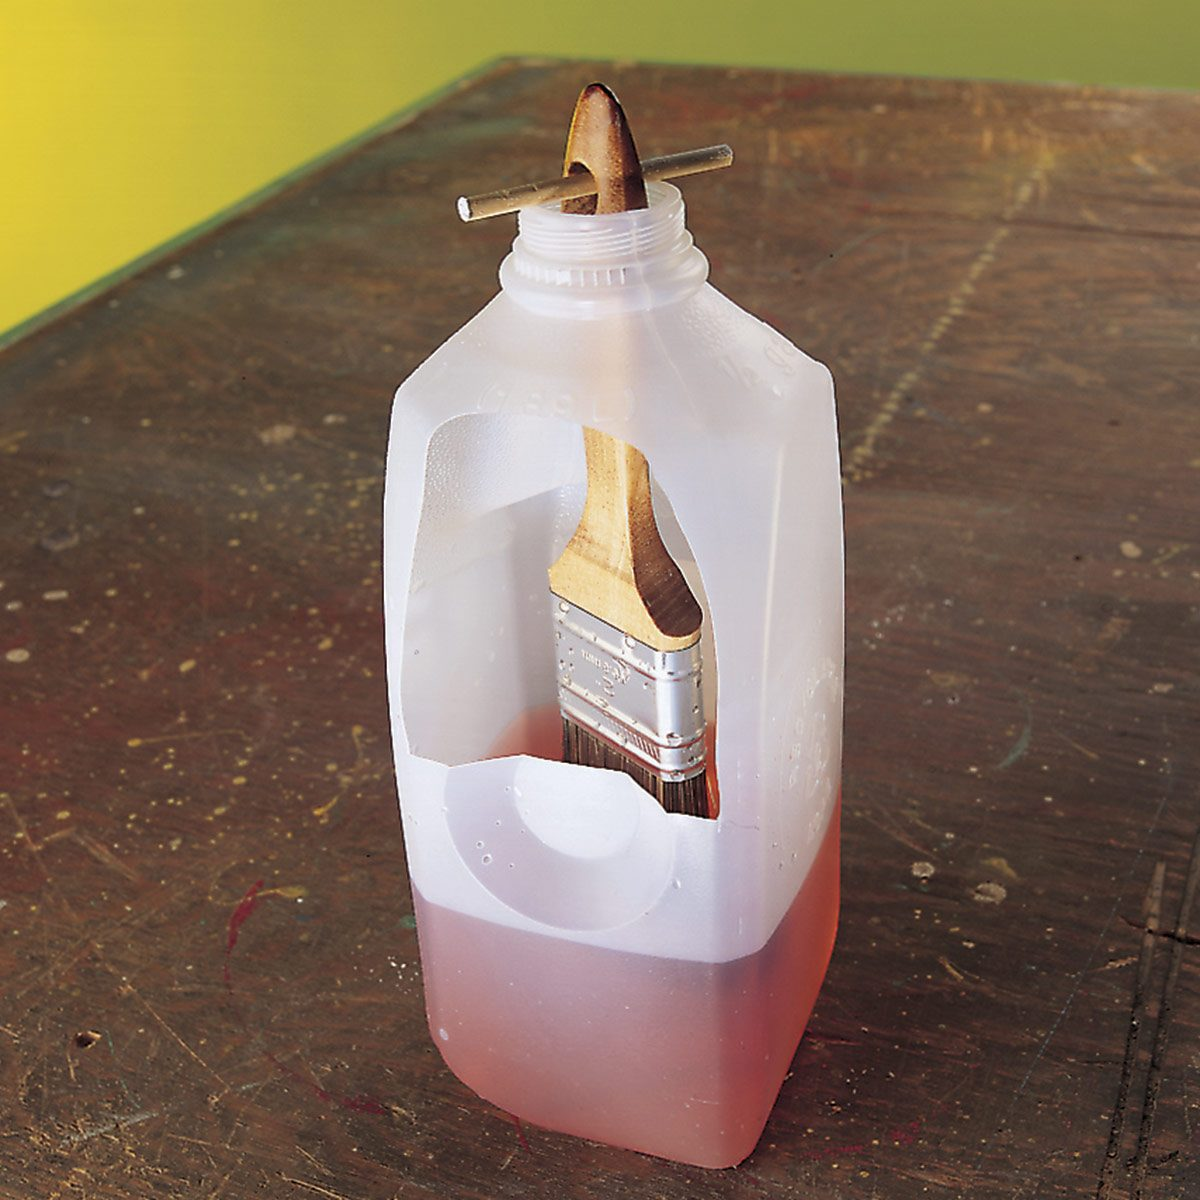 brush cleaning in milk jug